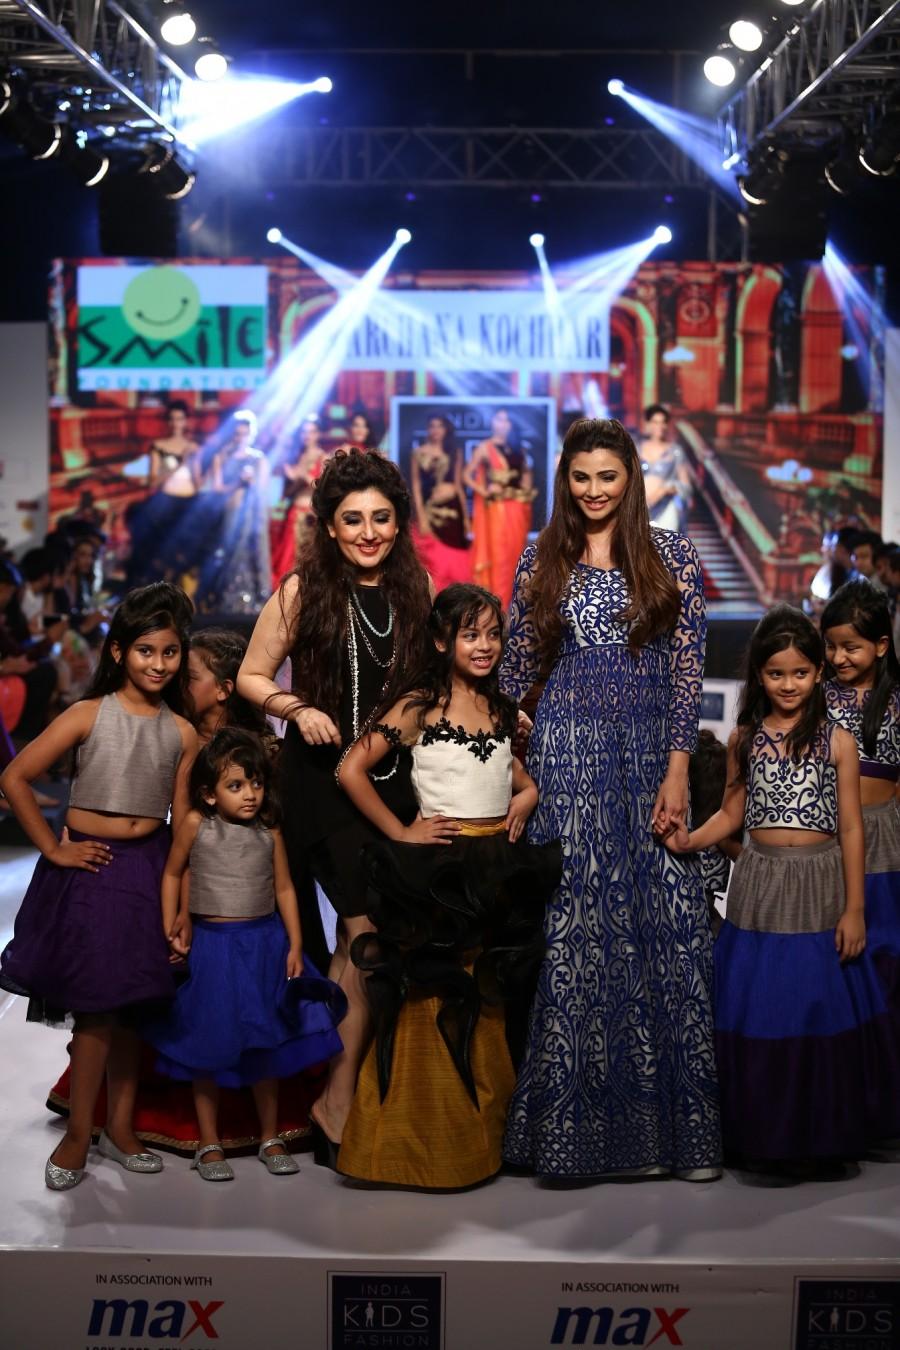 India Kids Fashion Week,India Kids Fashion Week Grand Finale,India Kids Fashion Week 2016,India Kids Fashion Week 2016 Grand Finale,Daisy Shah,Madhurima Tuli,Mika Singh,Kartik Aryan,Pia Bajpai